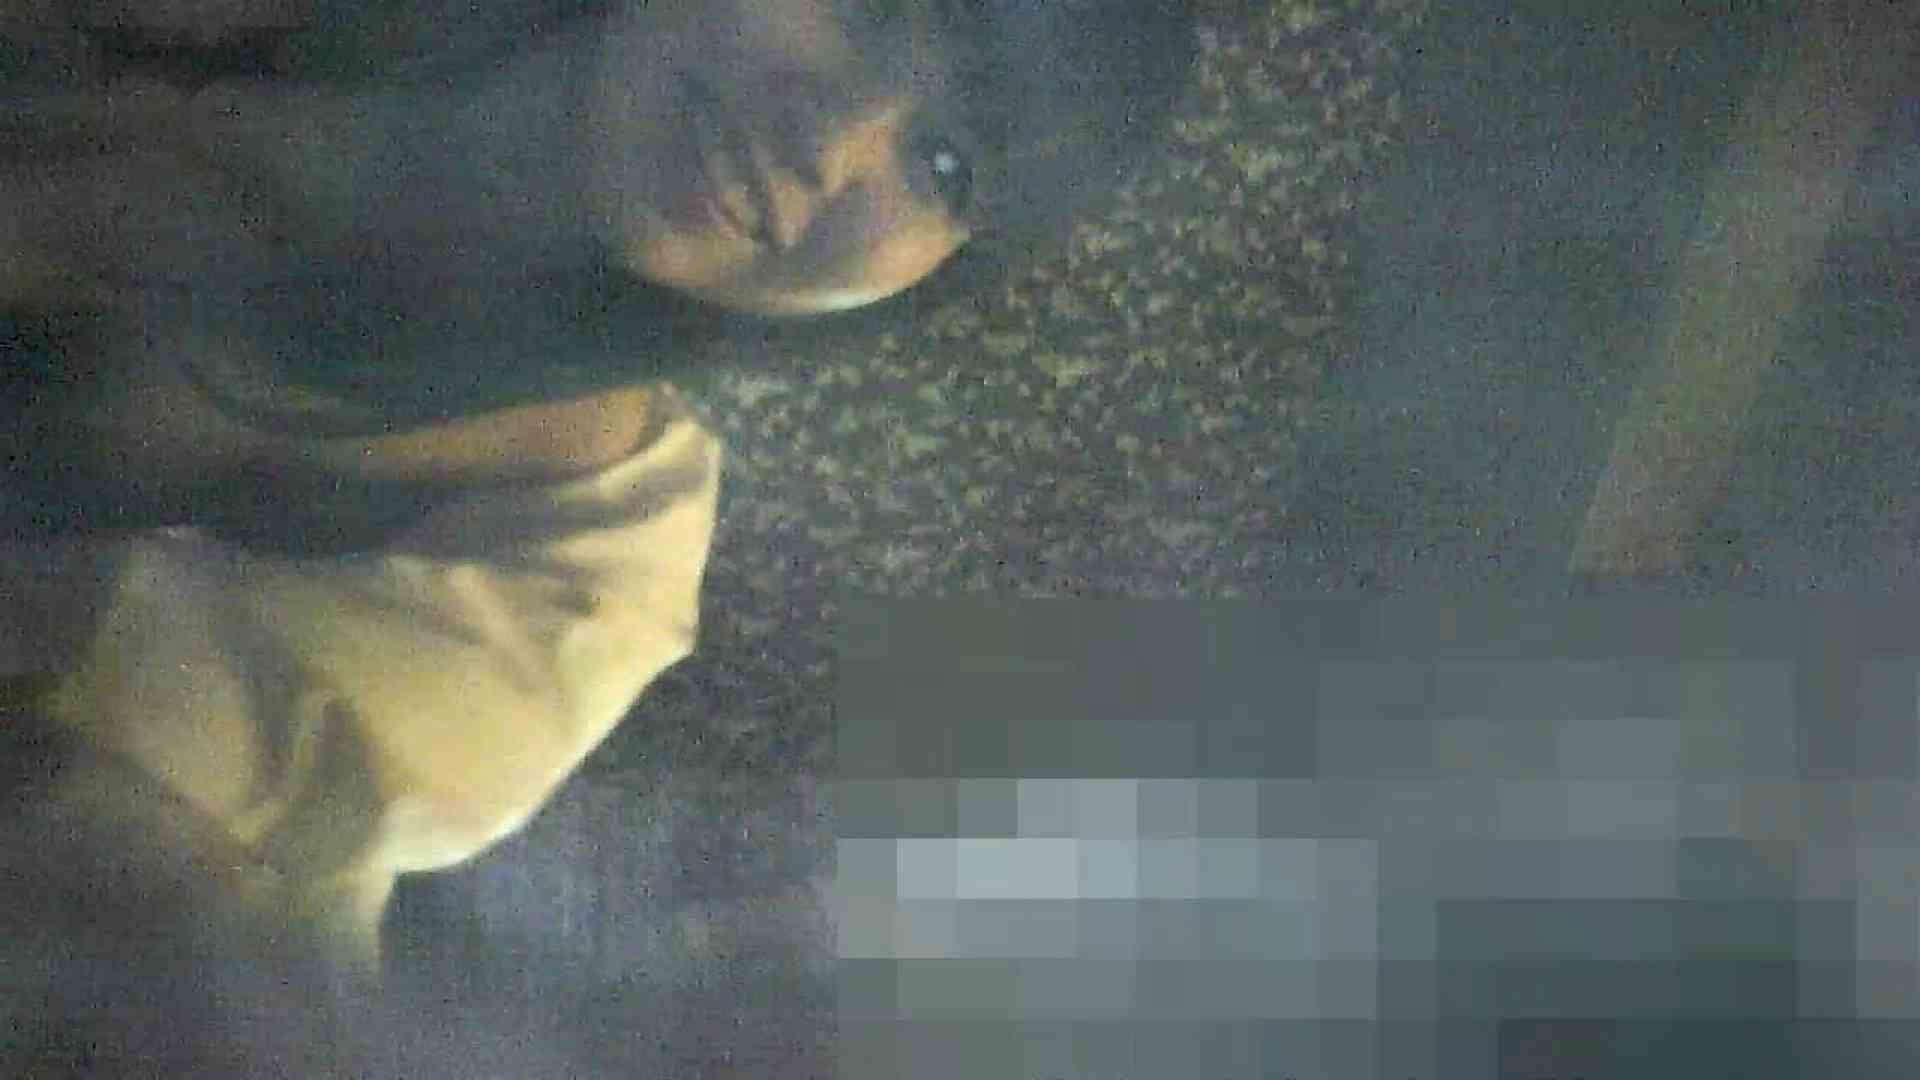 ▲2017_05位▲ 学園アイドル美人女子大生!❶4人厳選詰合せVol.49 人気作   女子大生  113画像 43